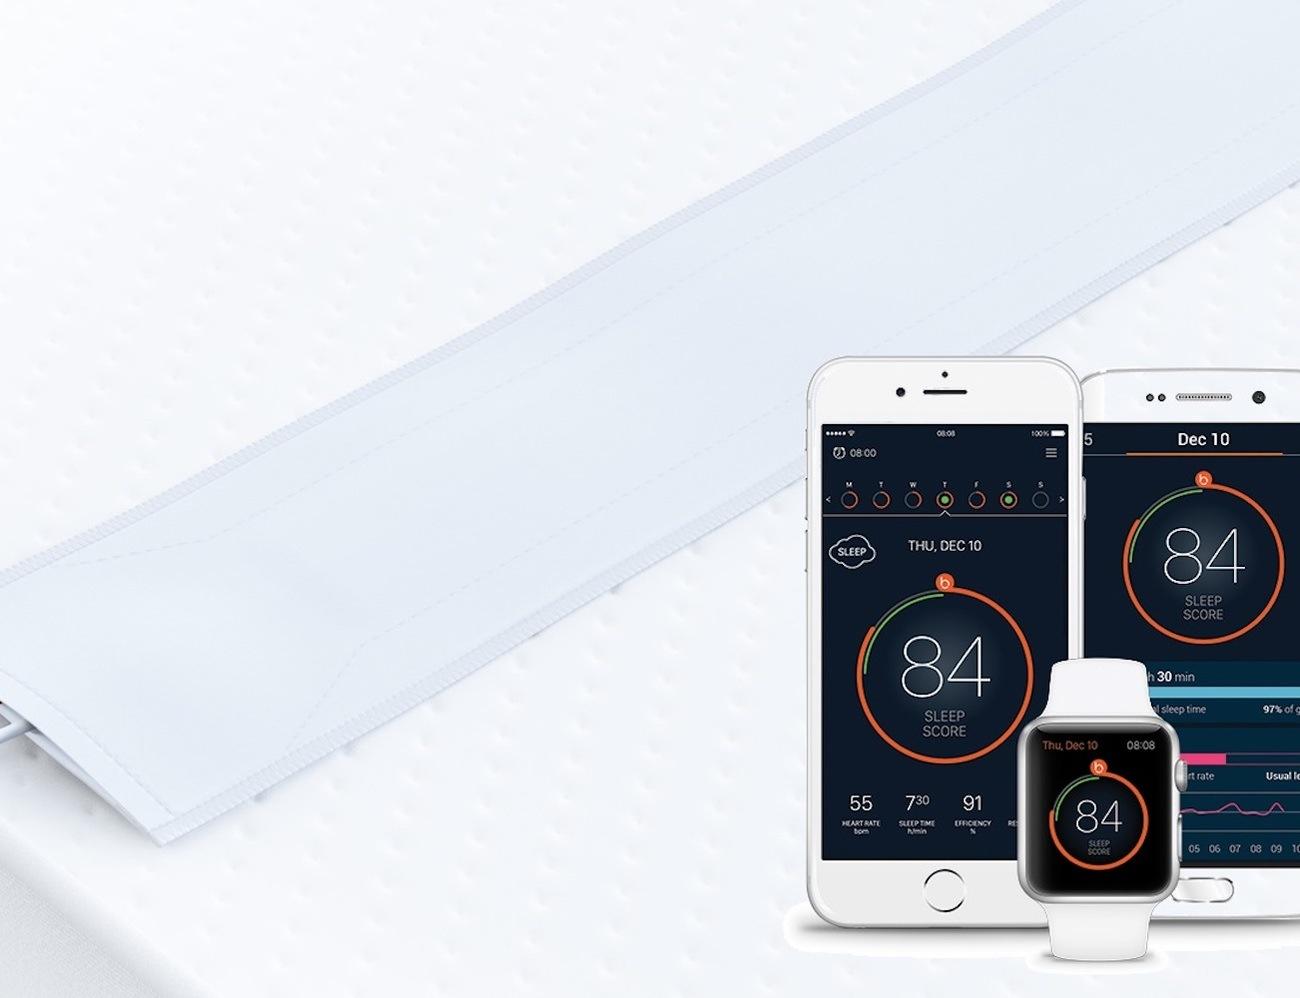 Beddit Sleep tracking monitor